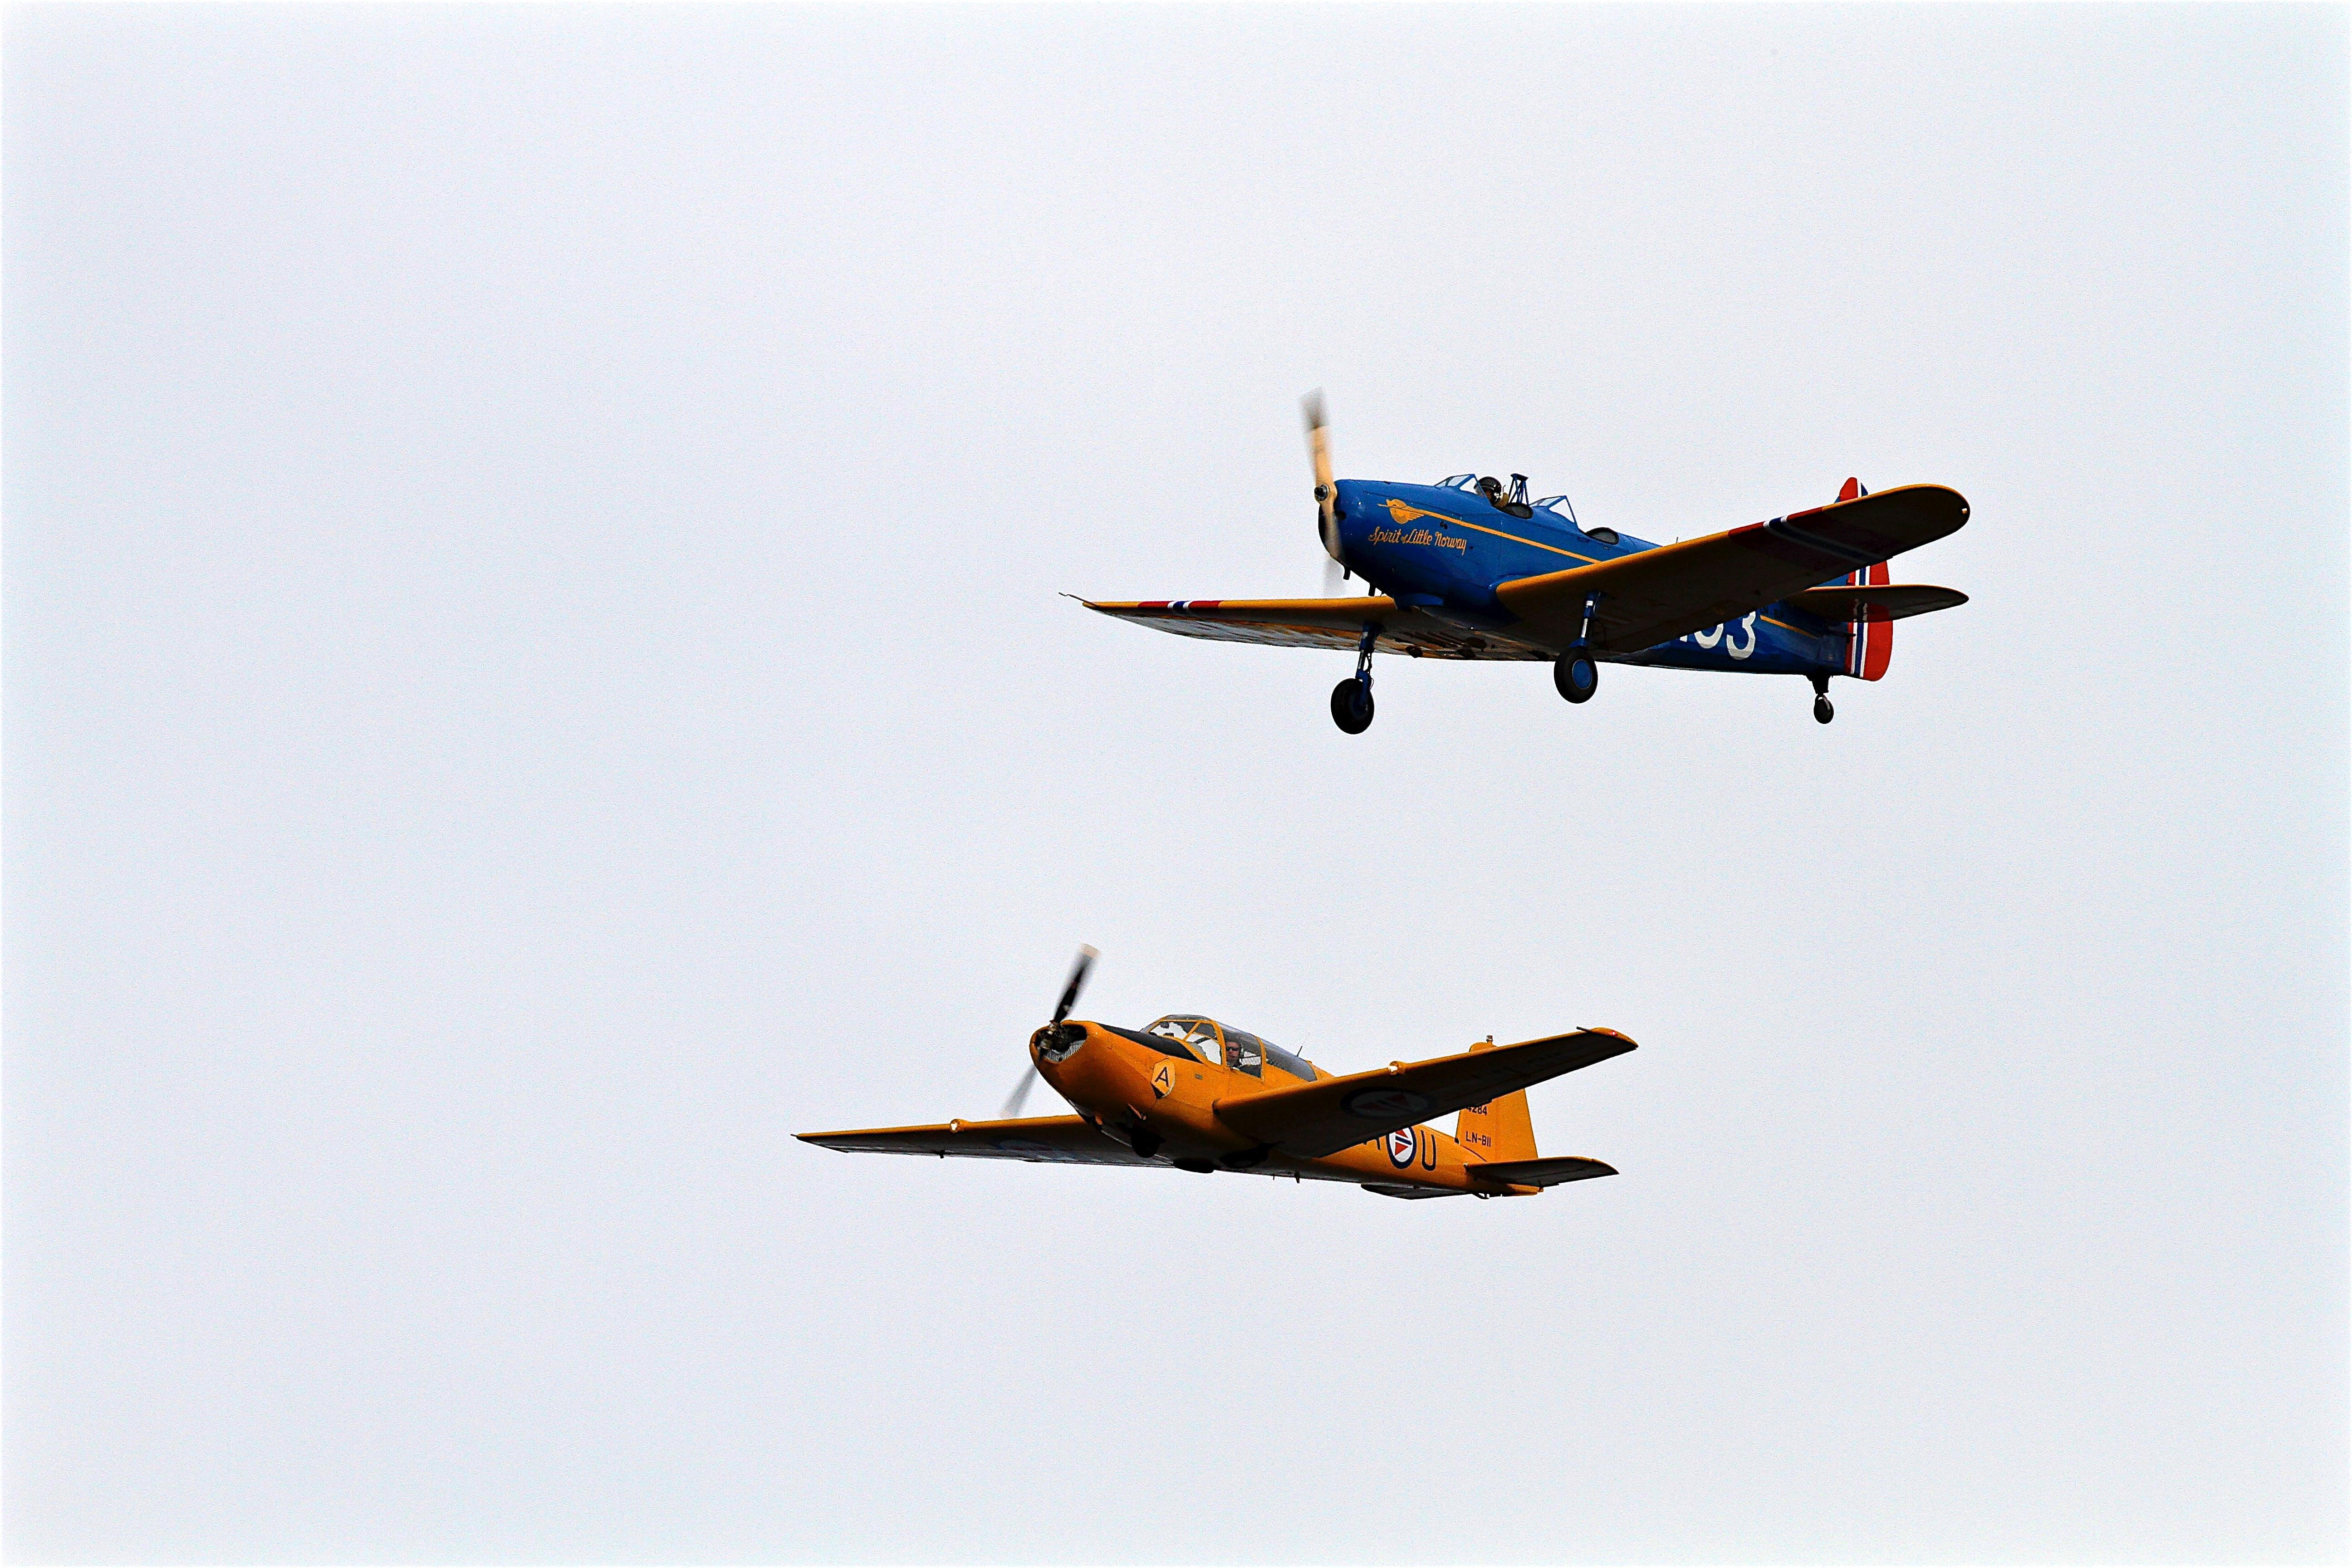 Kostenloses Stock Foto zu flug, flugzeuge, himmel, luftfahrt